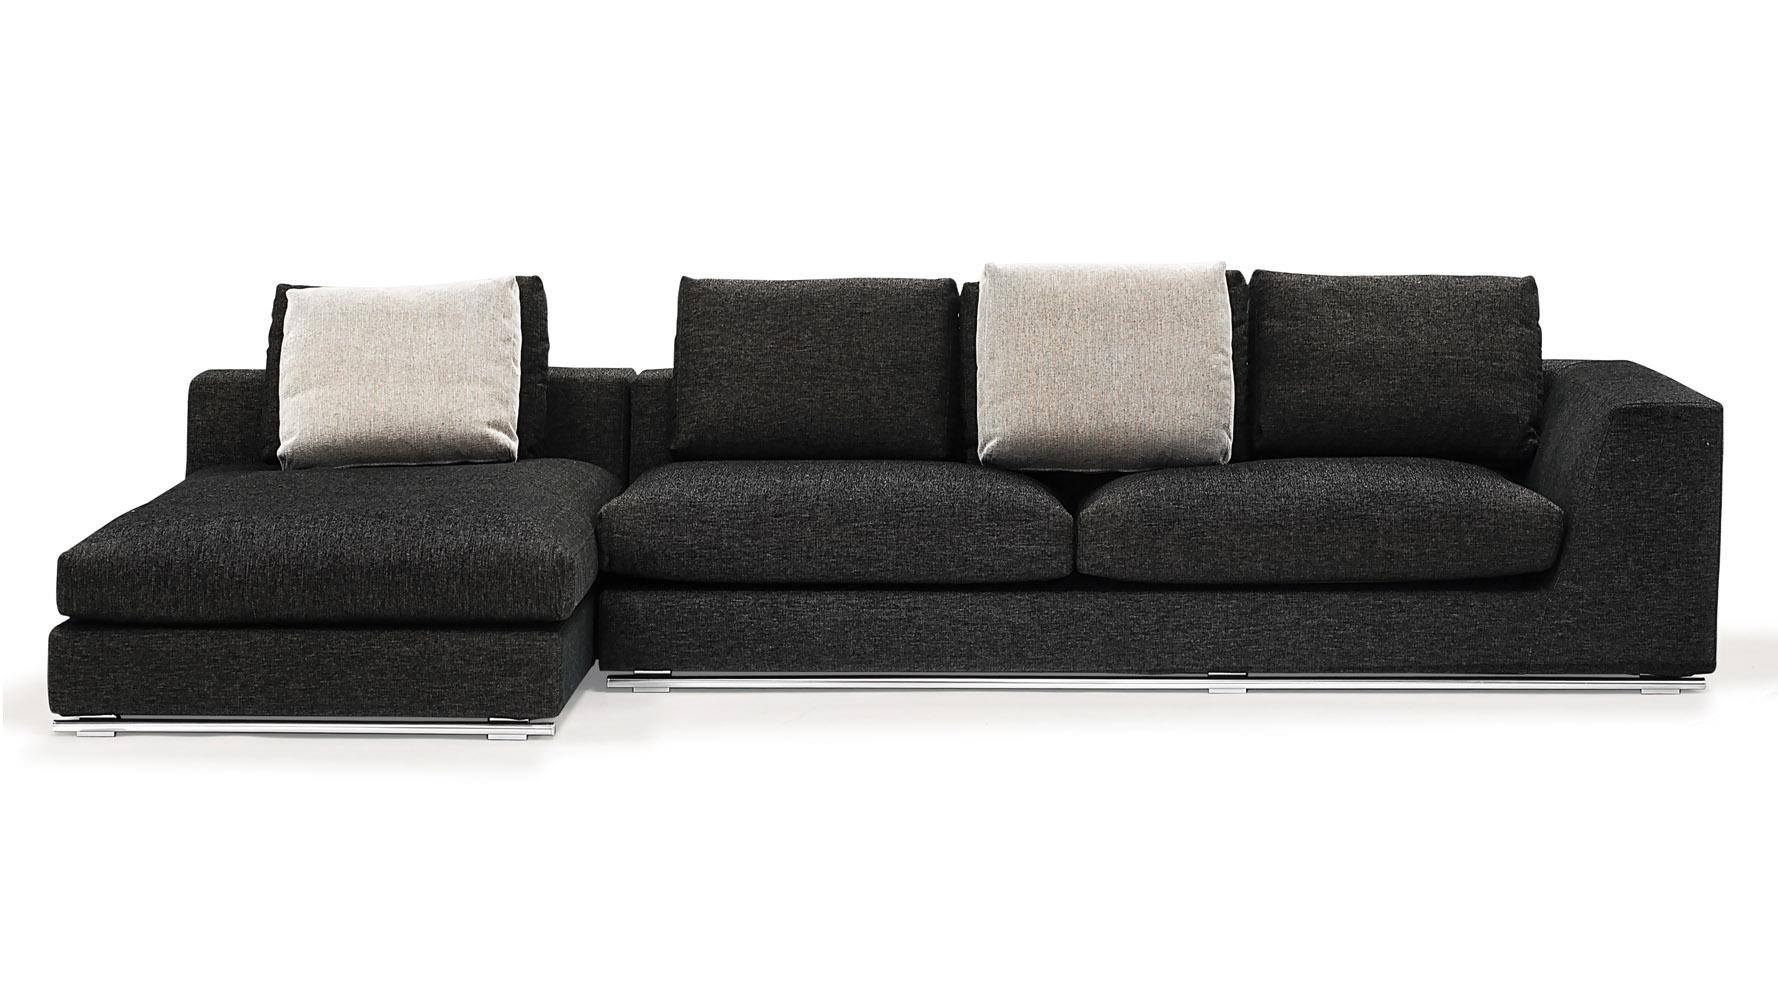 odo Sectional Sofa With Ottoman Charcoal